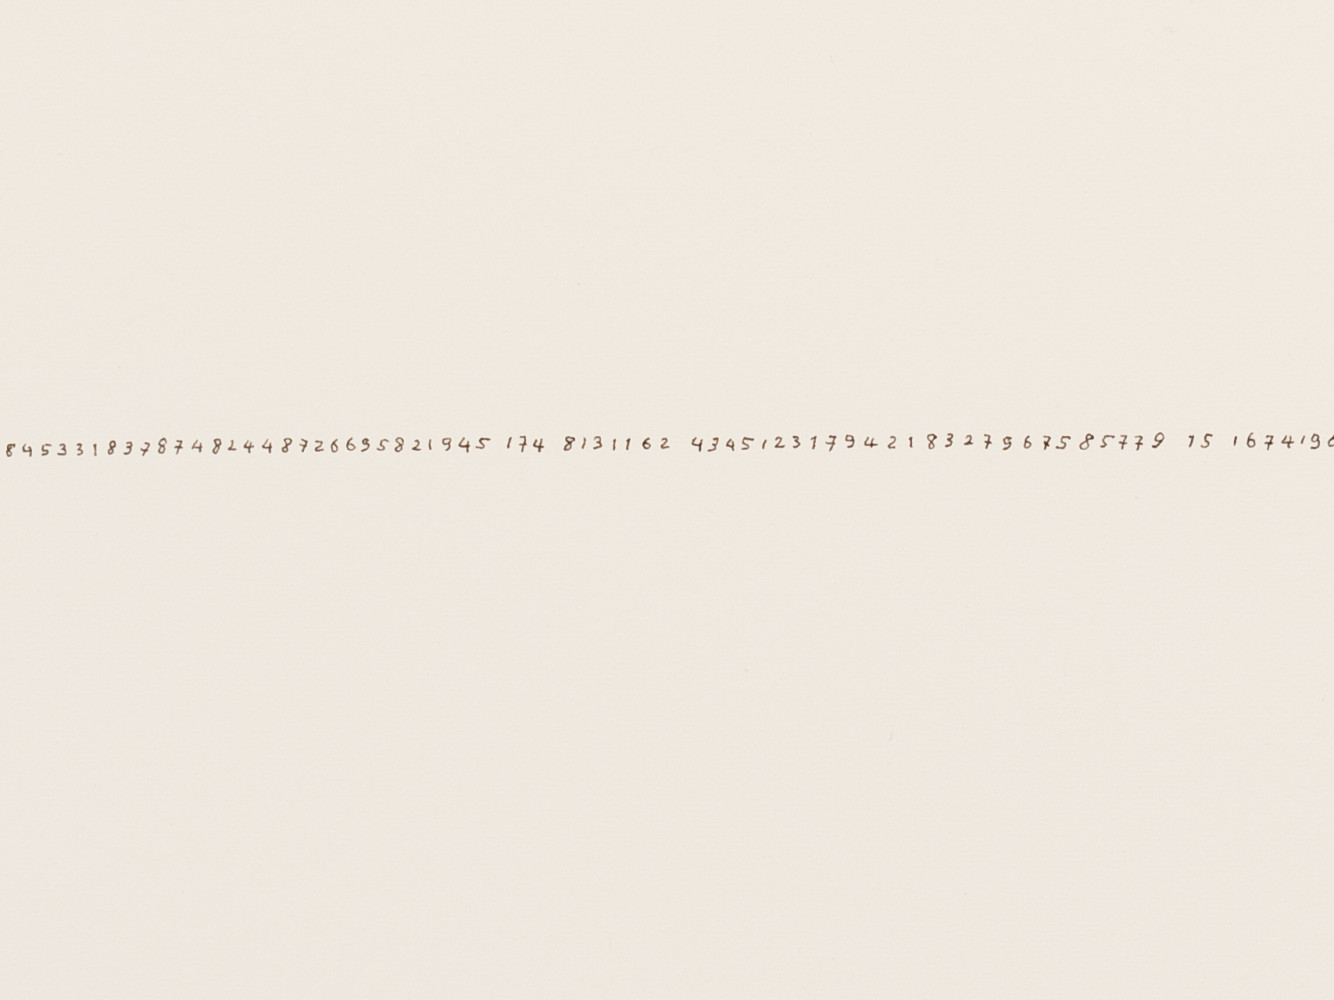 Tatsuo Miyajima, 'Hand-drawn Innumerable Counts 20180218 (Detail)', 2018